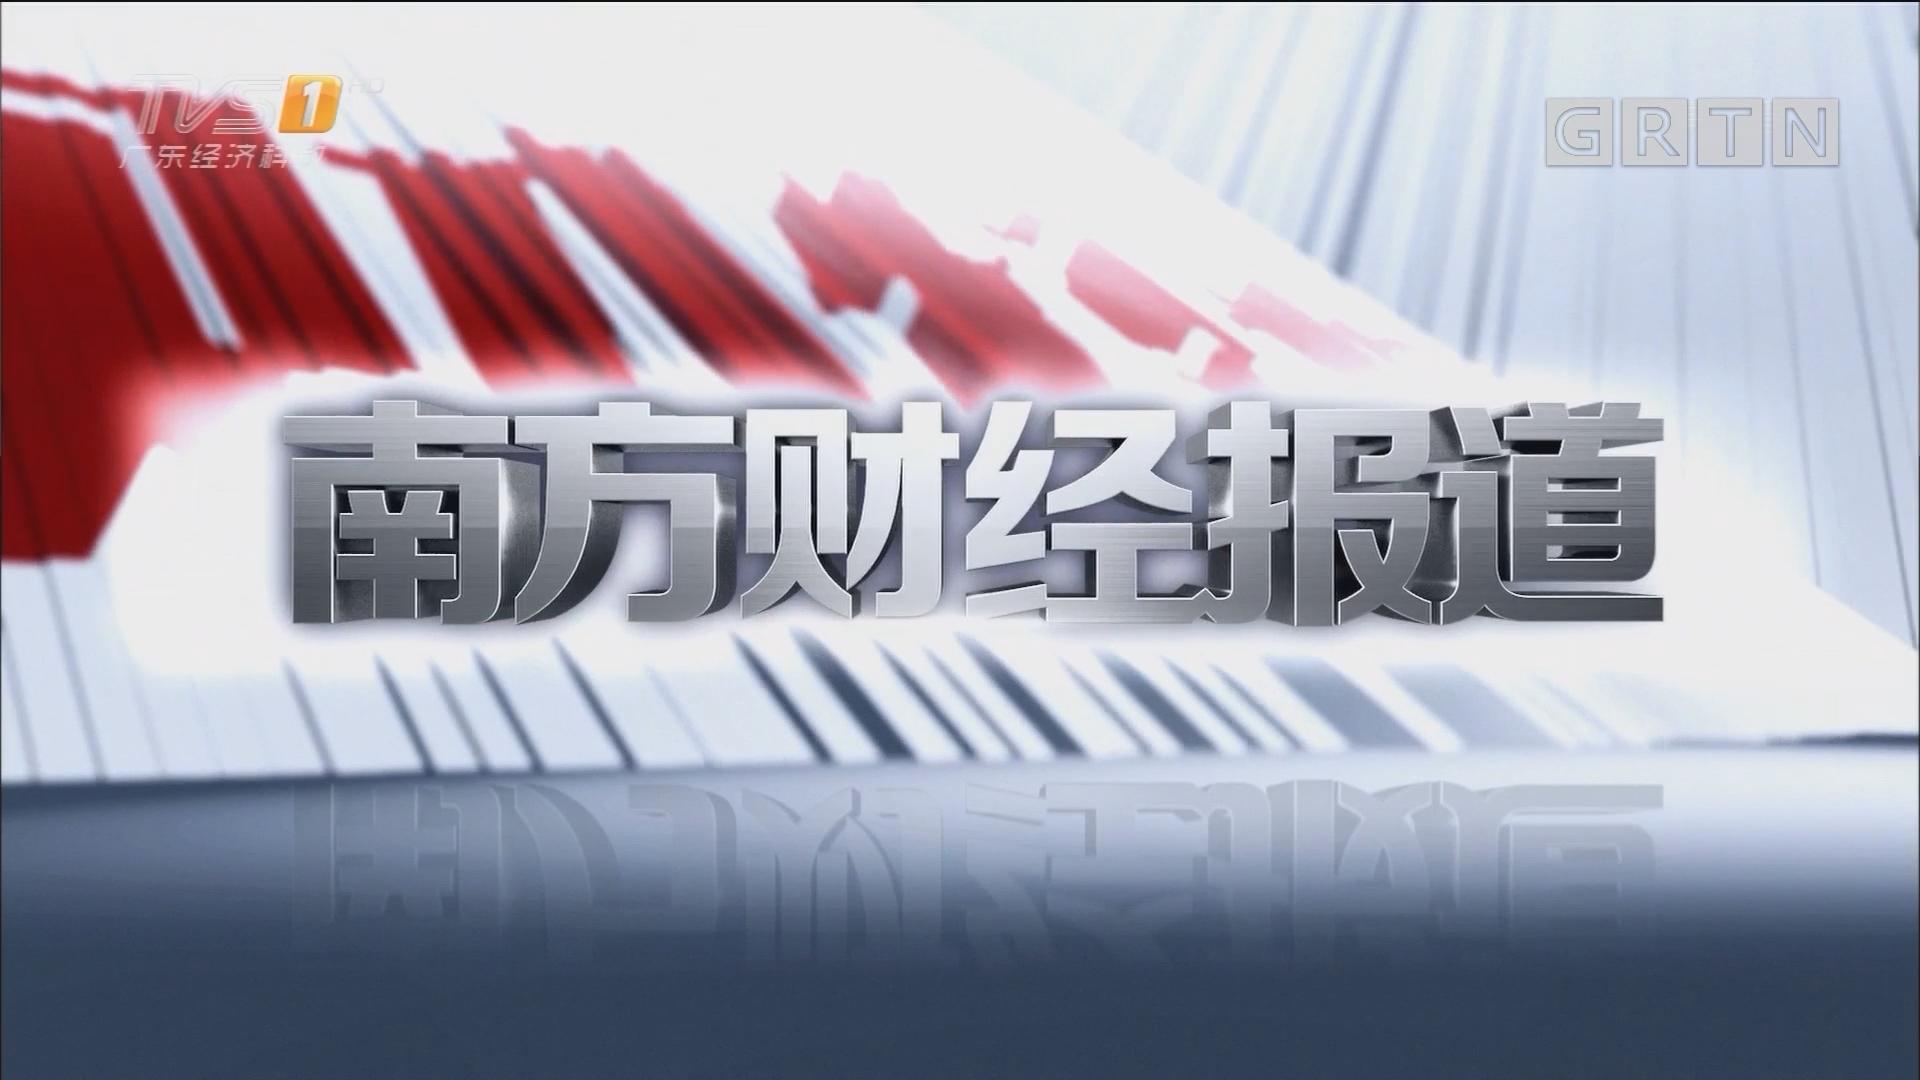 [HD][2018-06-10]南方财经报道:走进青岛·聚焦上合峰会:习近平在上海合作组织青岛峰会欢迎宴会上的祝酒辞